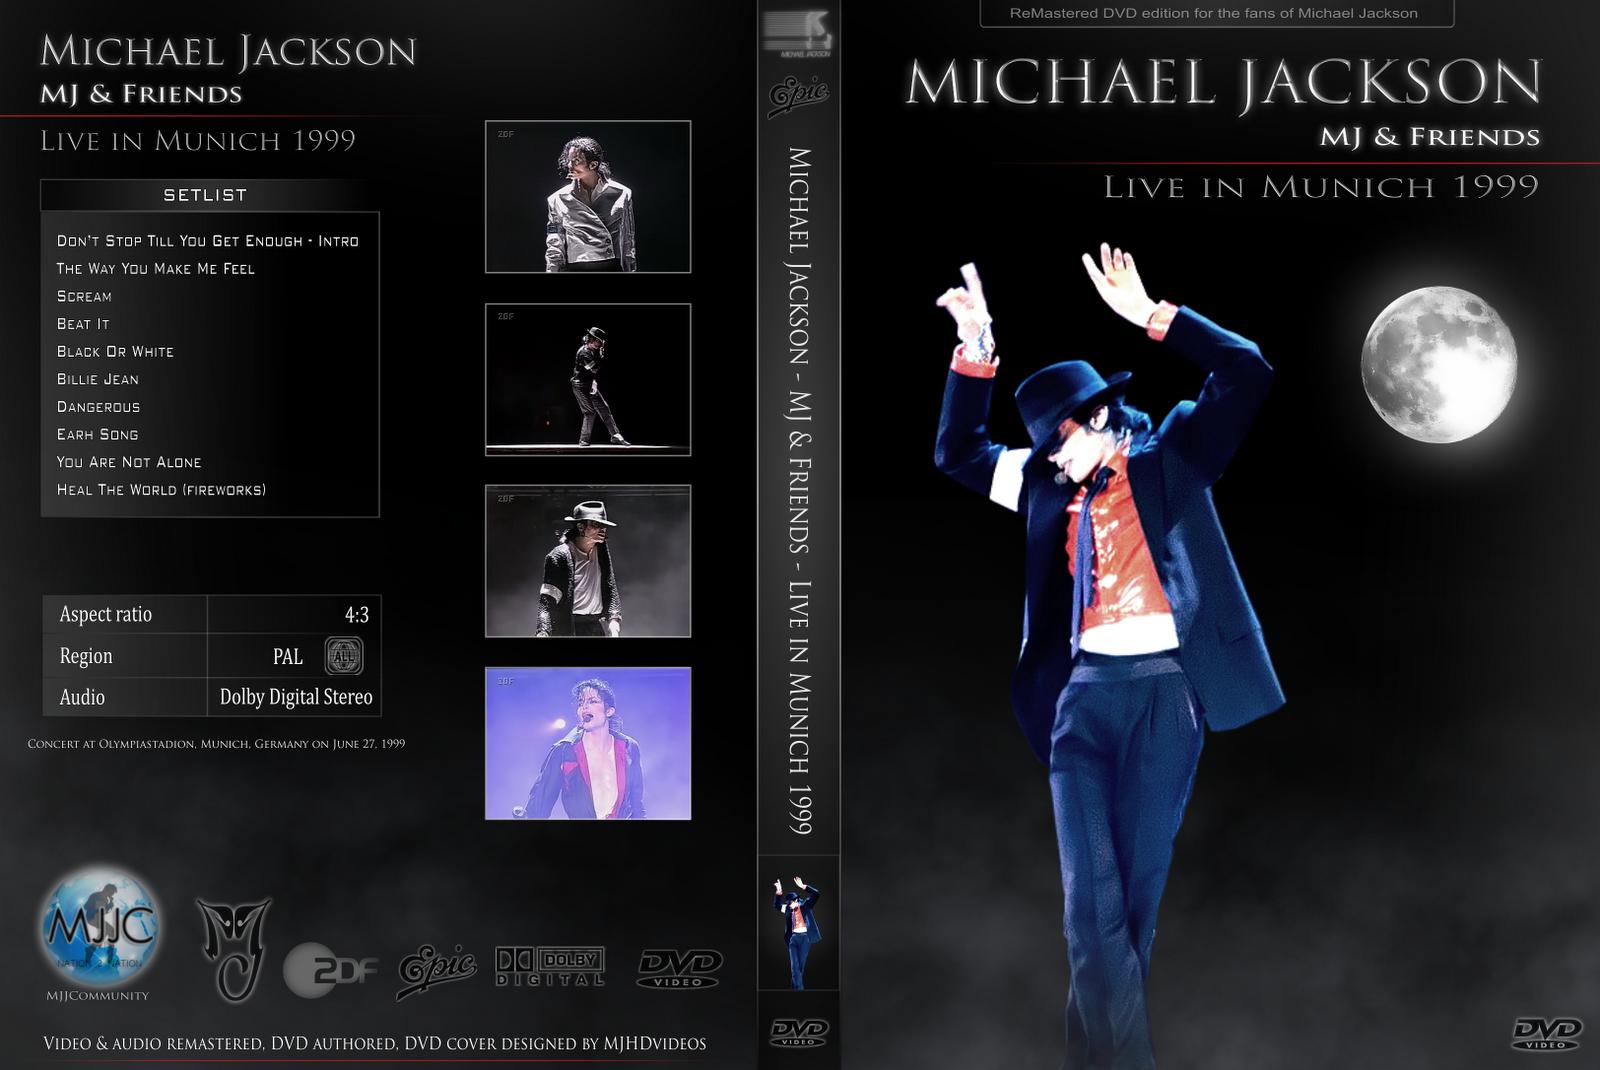 http://2.bp.blogspot.com/-R5AbHKin3dY/TmItQgc44KI/AAAAAAAABMA/L1zJwXQV1X8/s1600/Munich+1999+-+DVD+cover.png